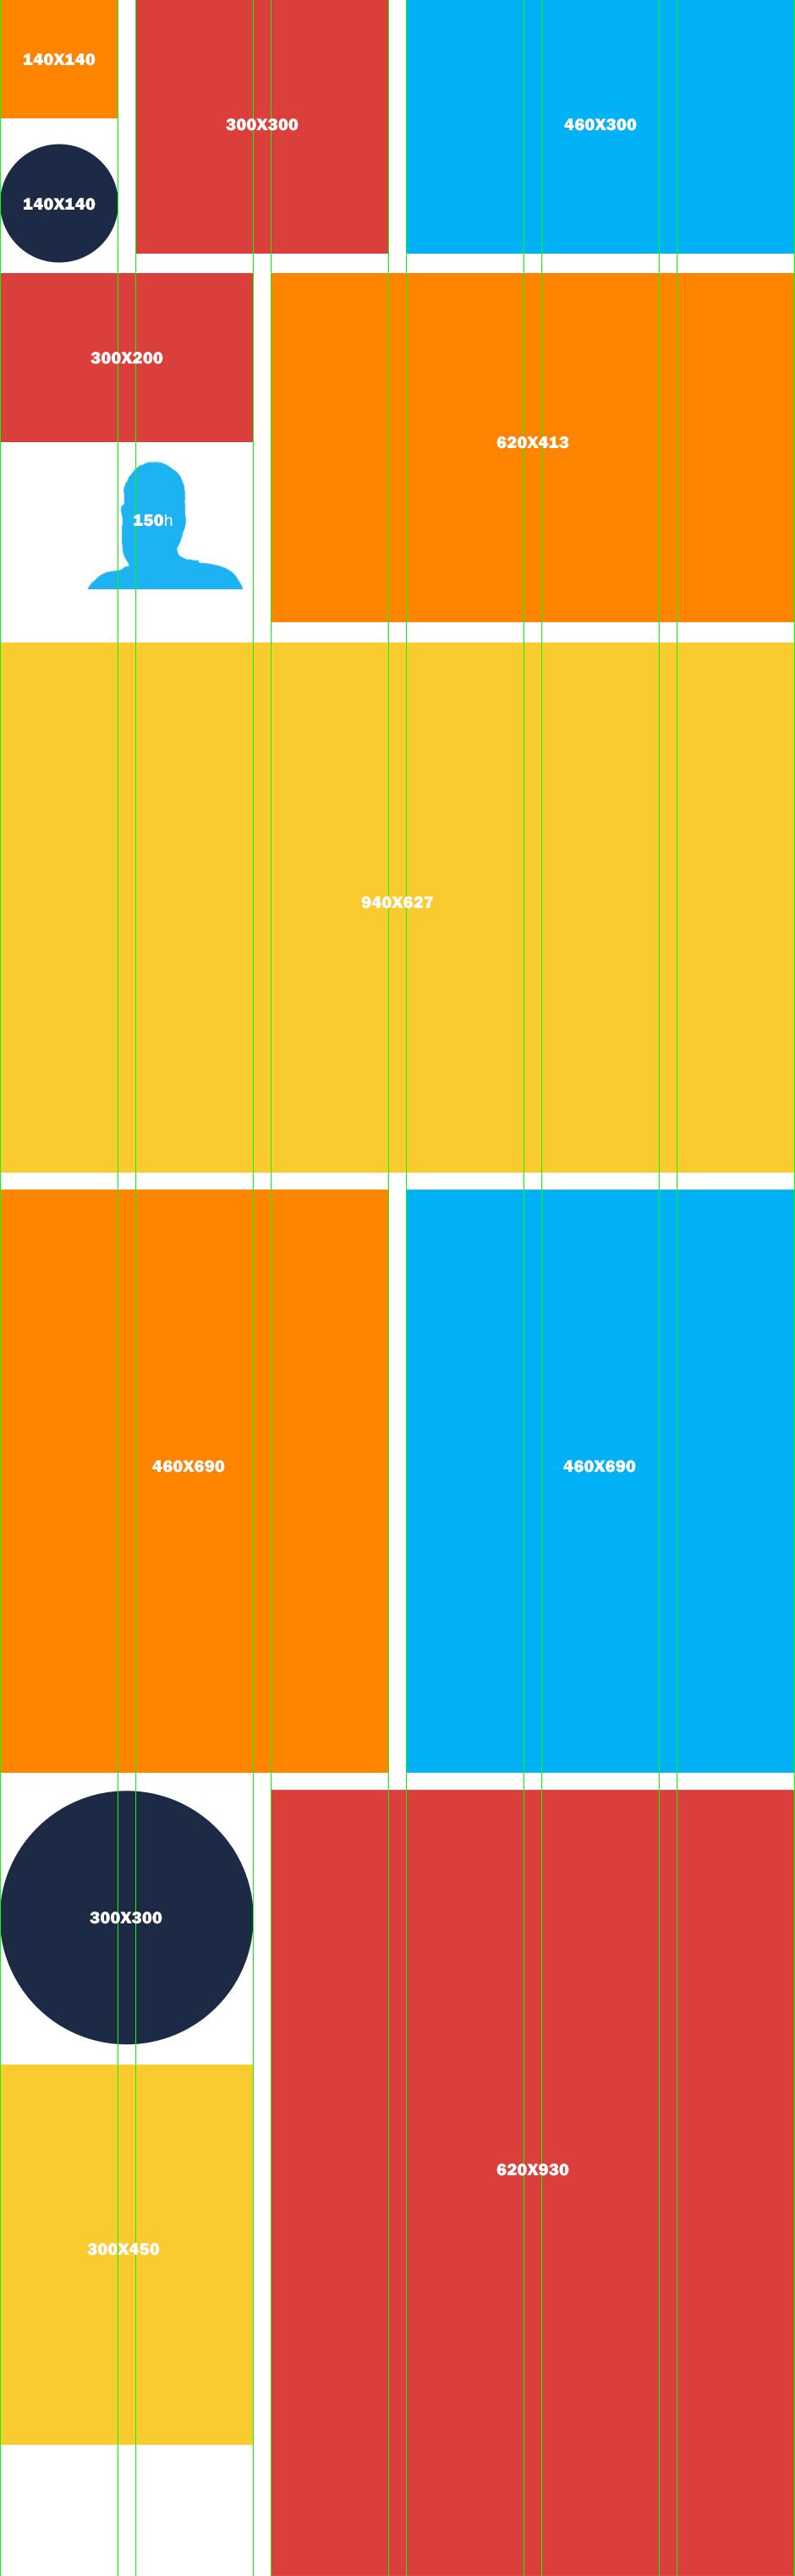 Design guide to H&F. Image 55.